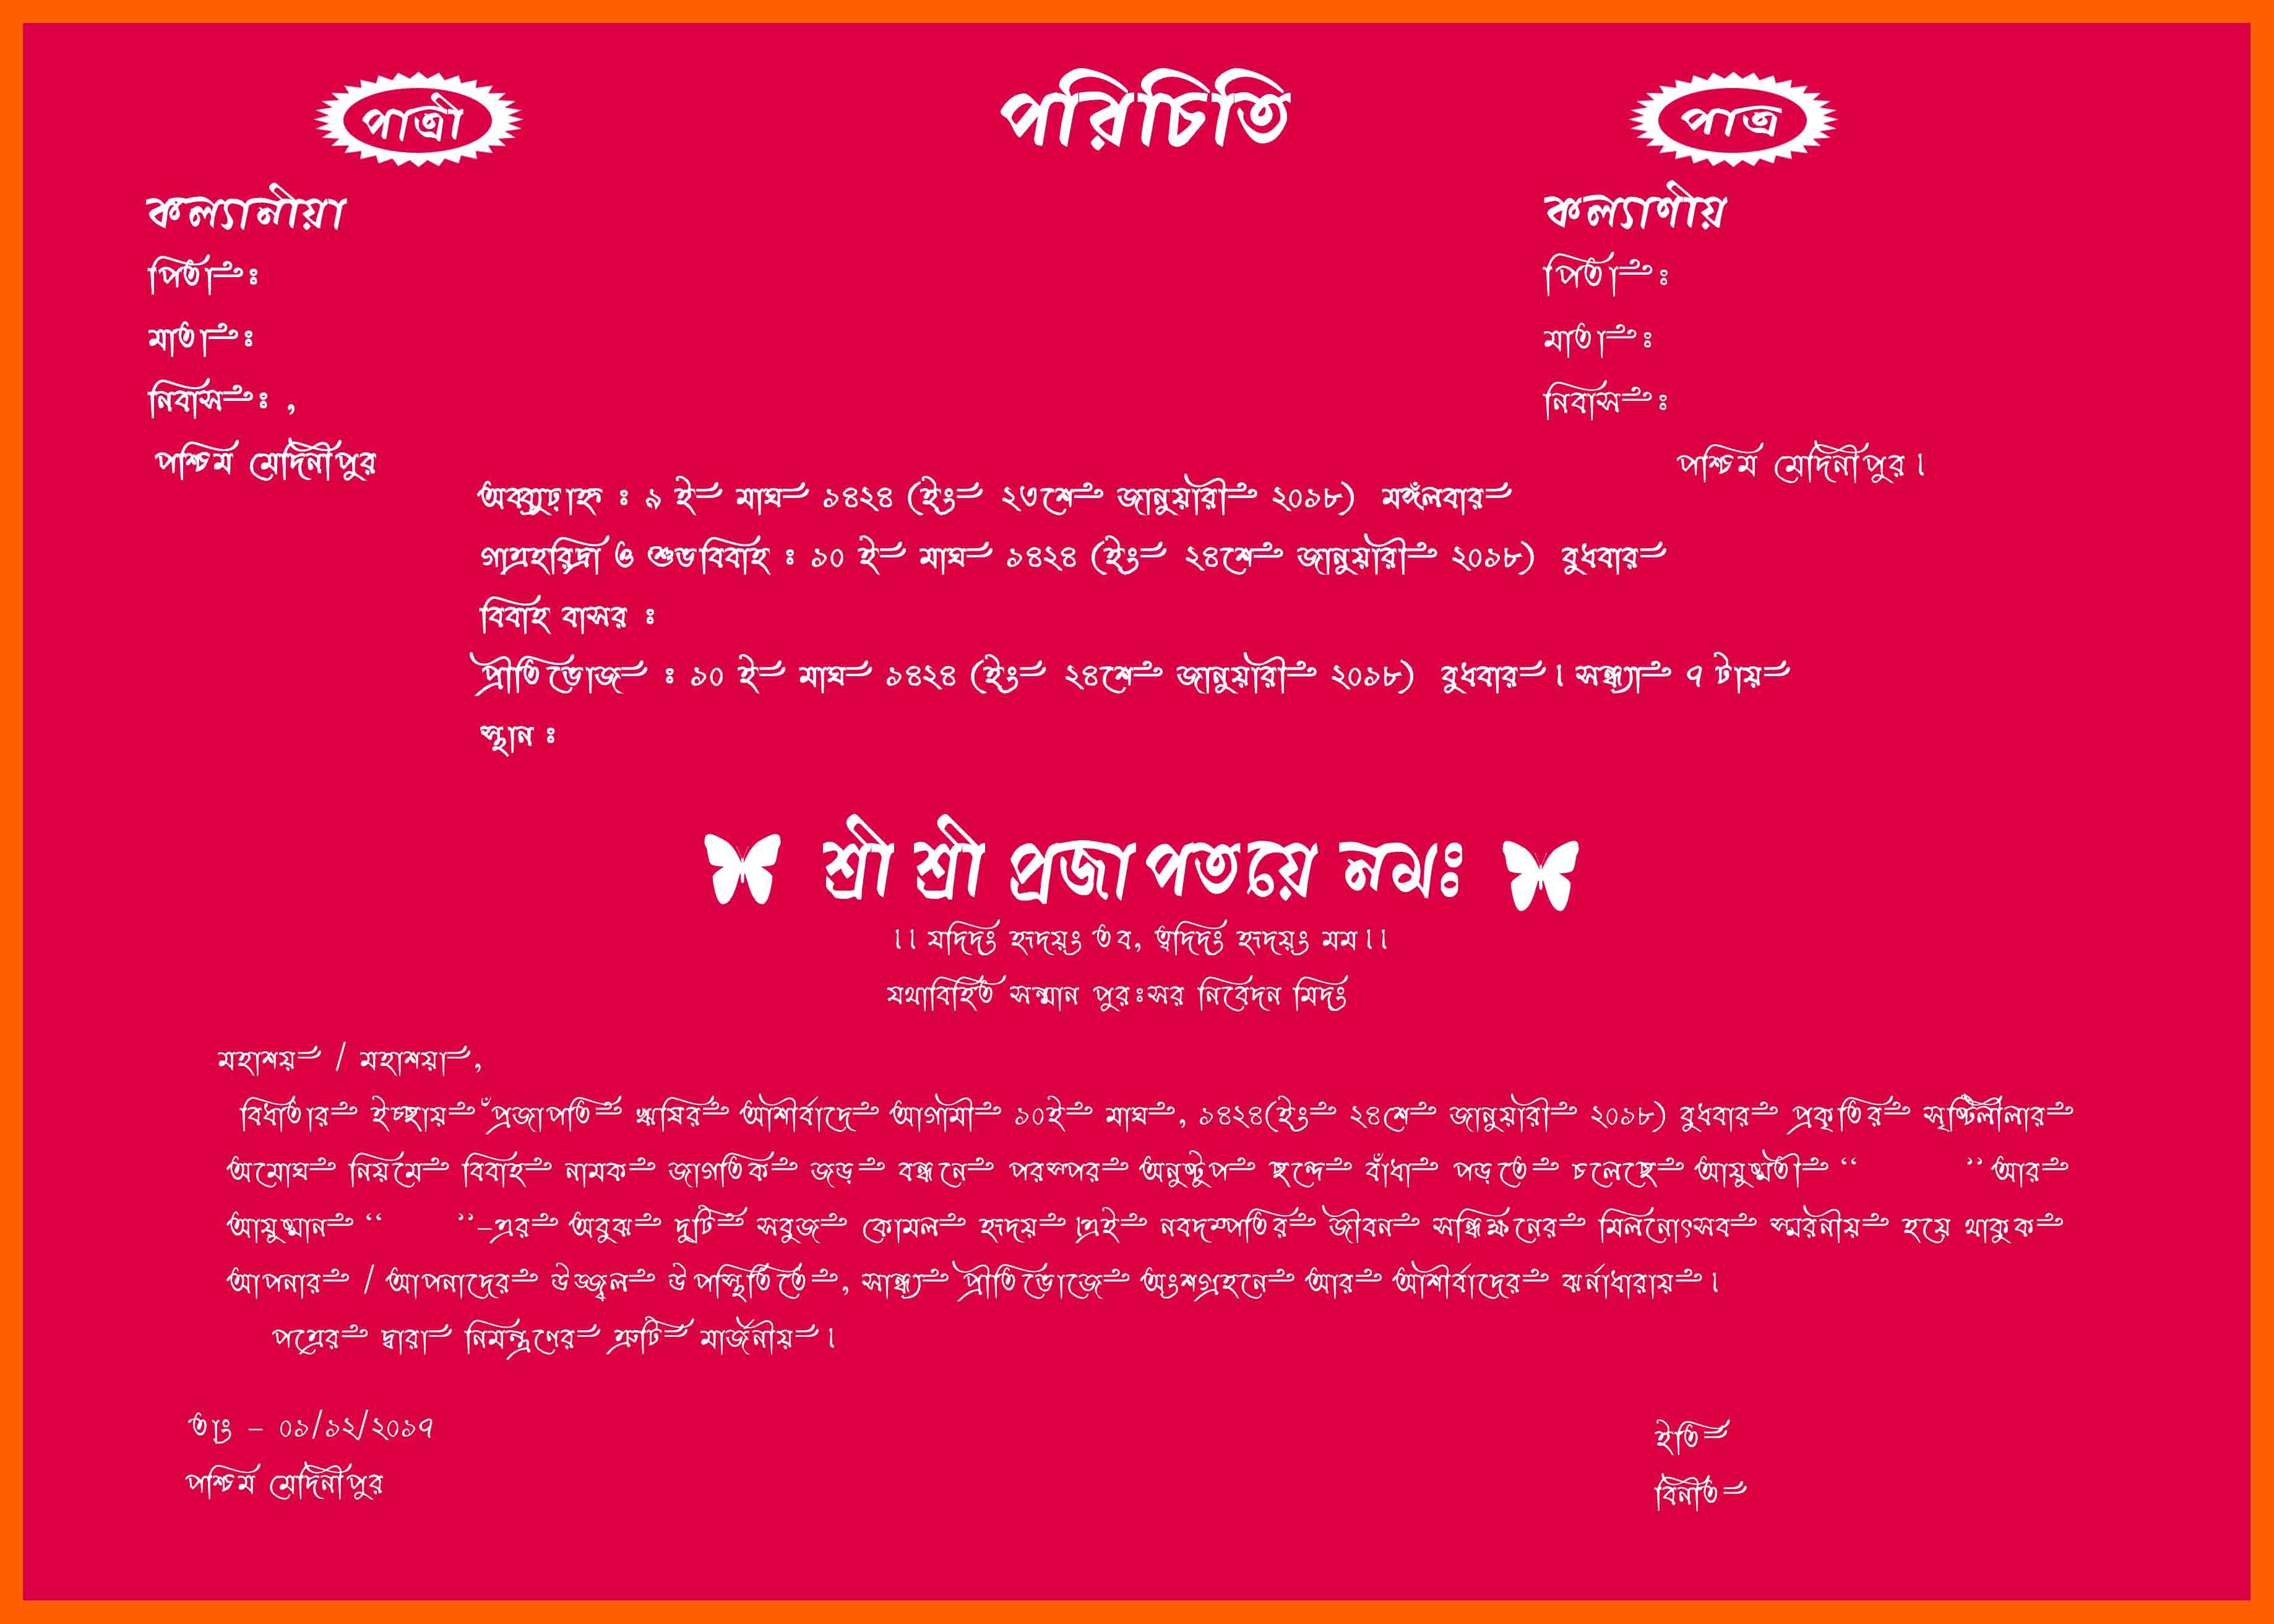 Hindu Wedding Invitation Card Red Background Design Latest Design